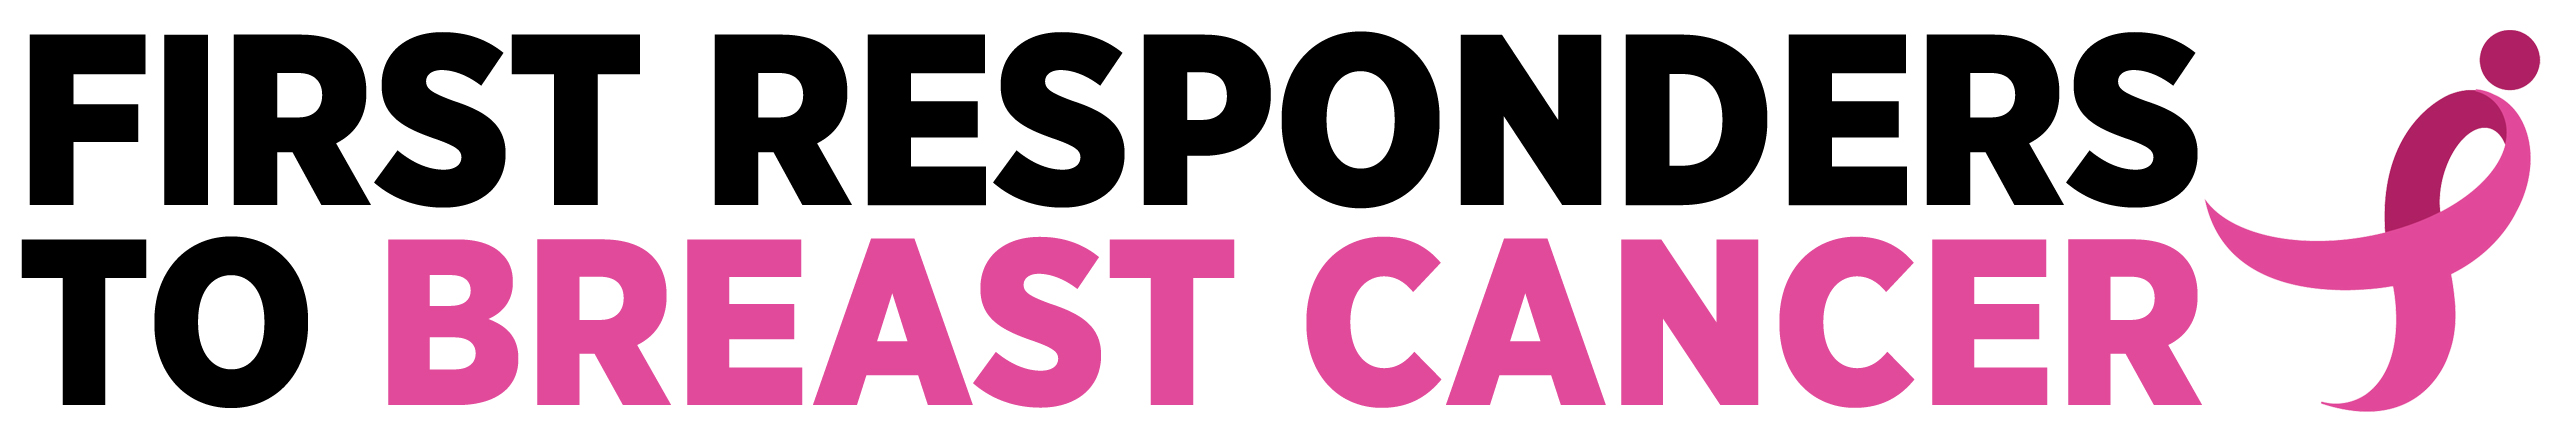 First Responders logo.jpg